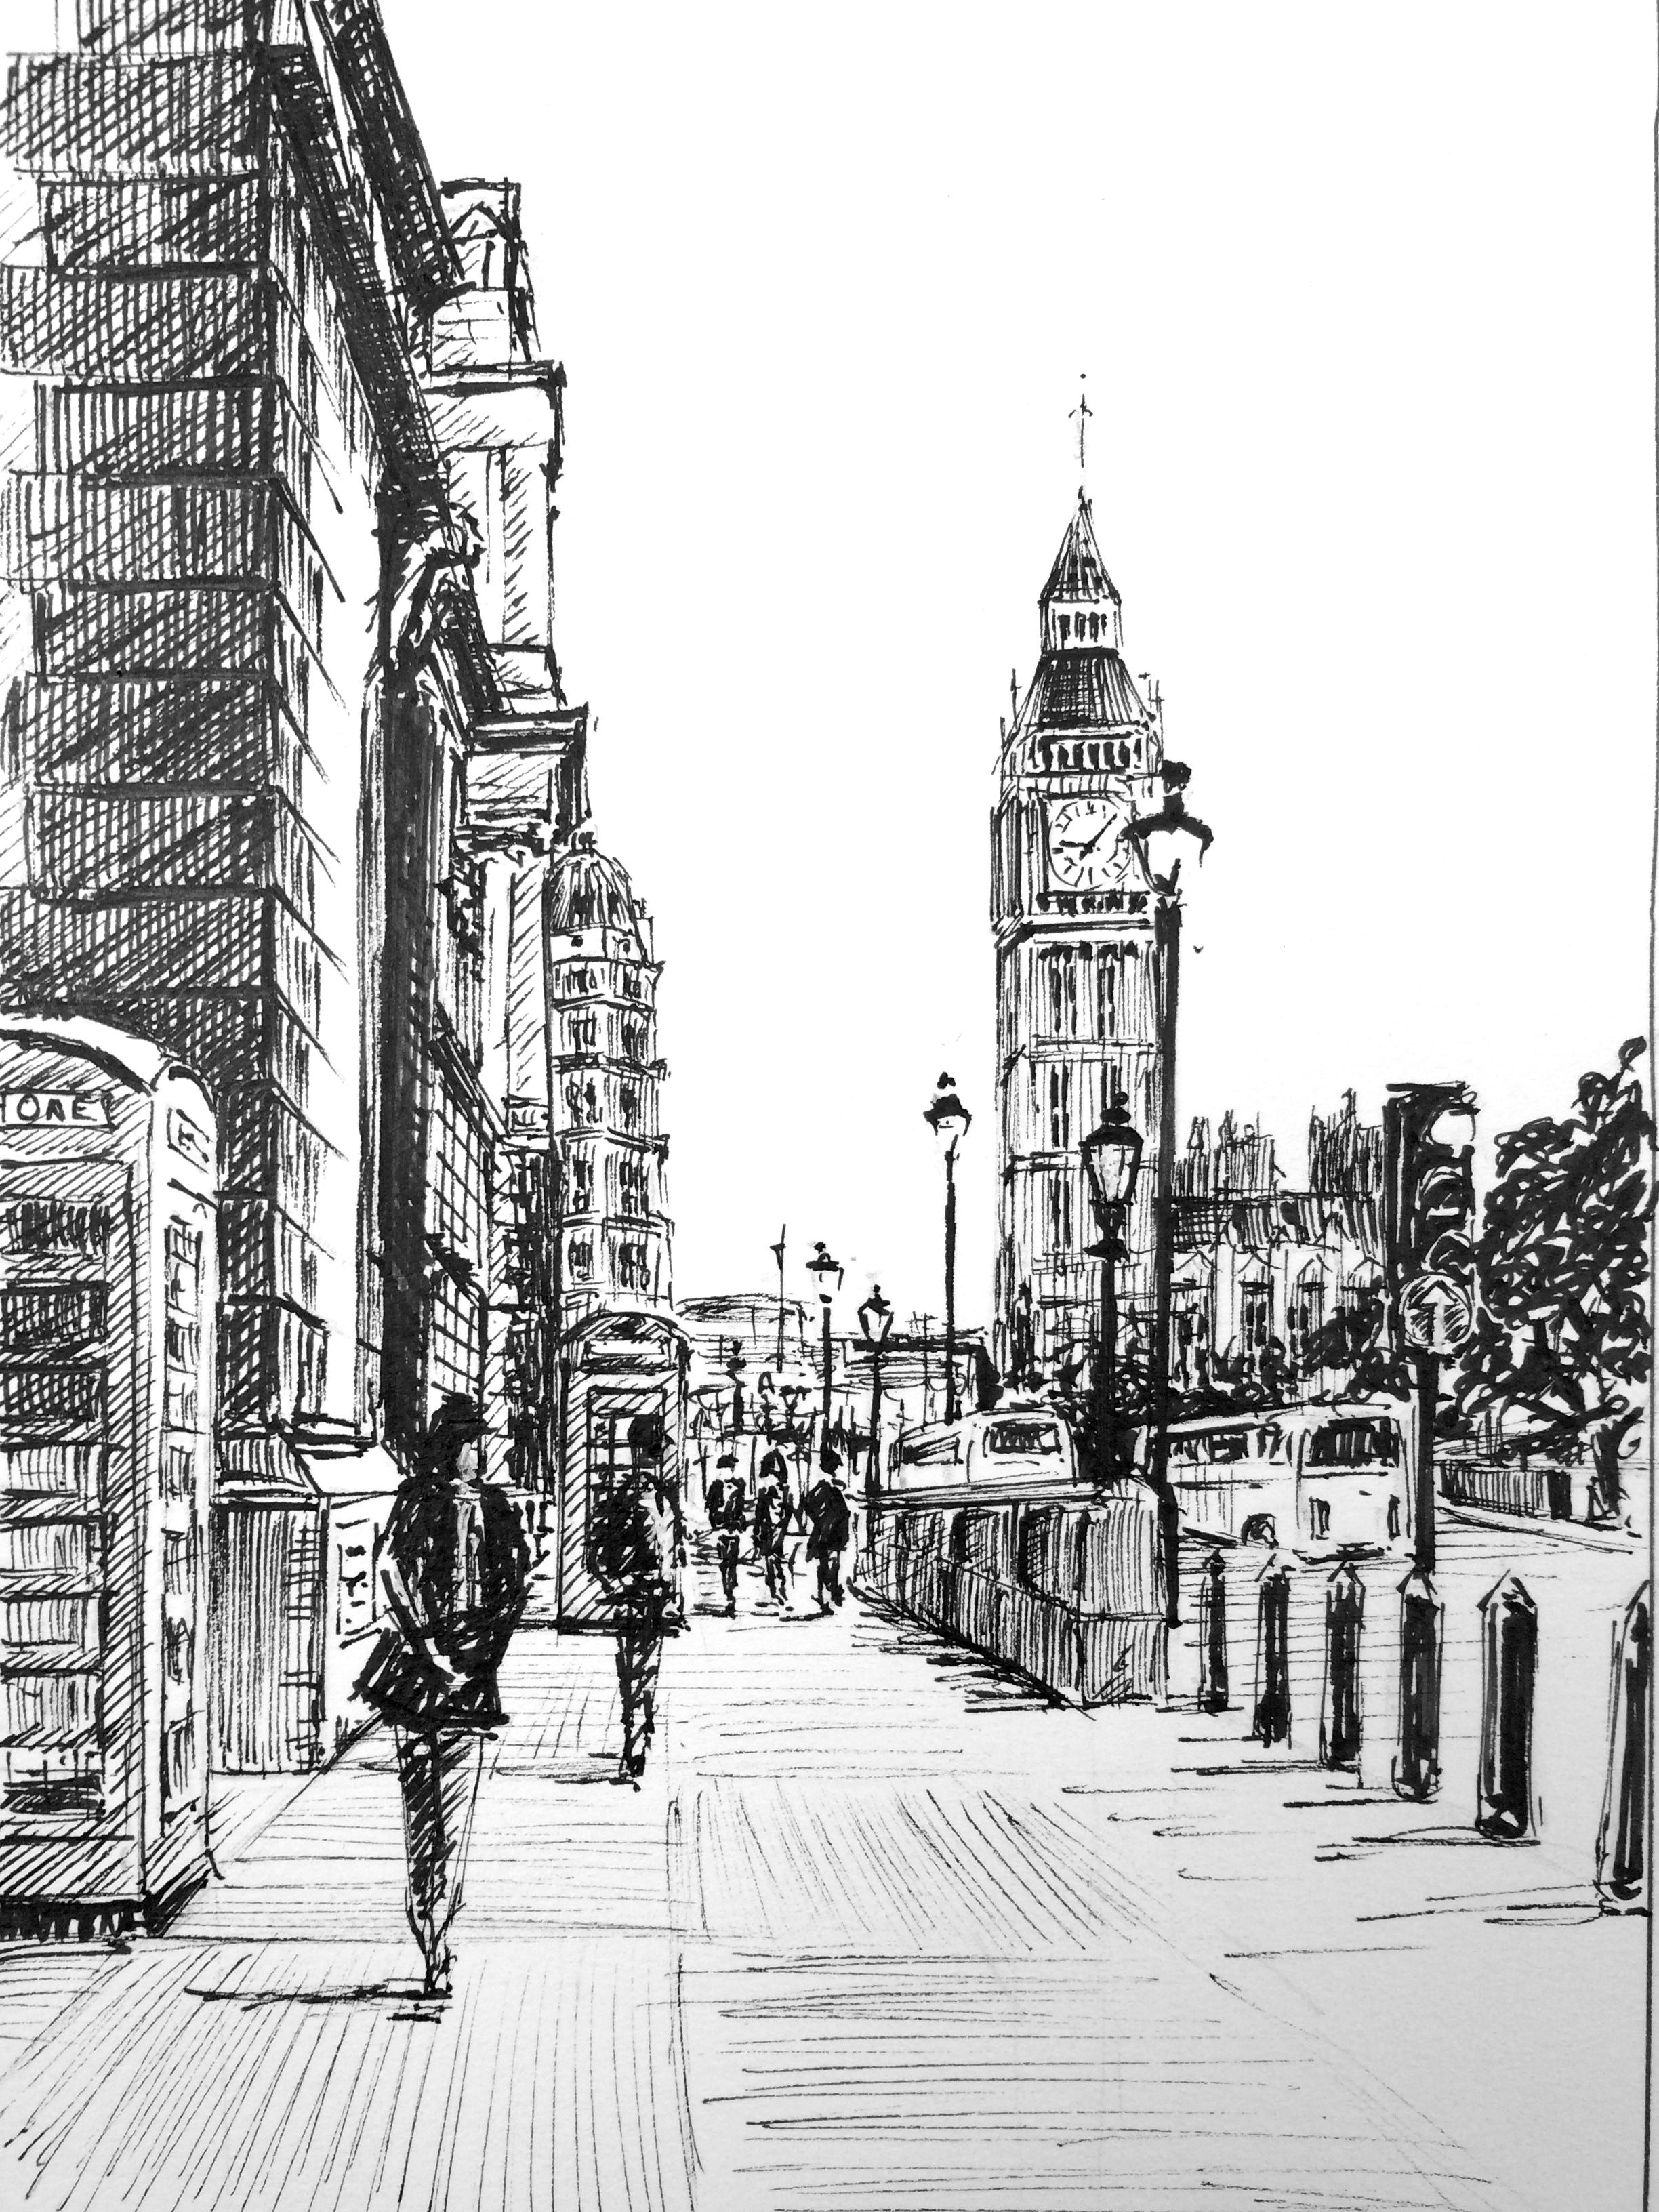 Drawn big ben wallpaper #2